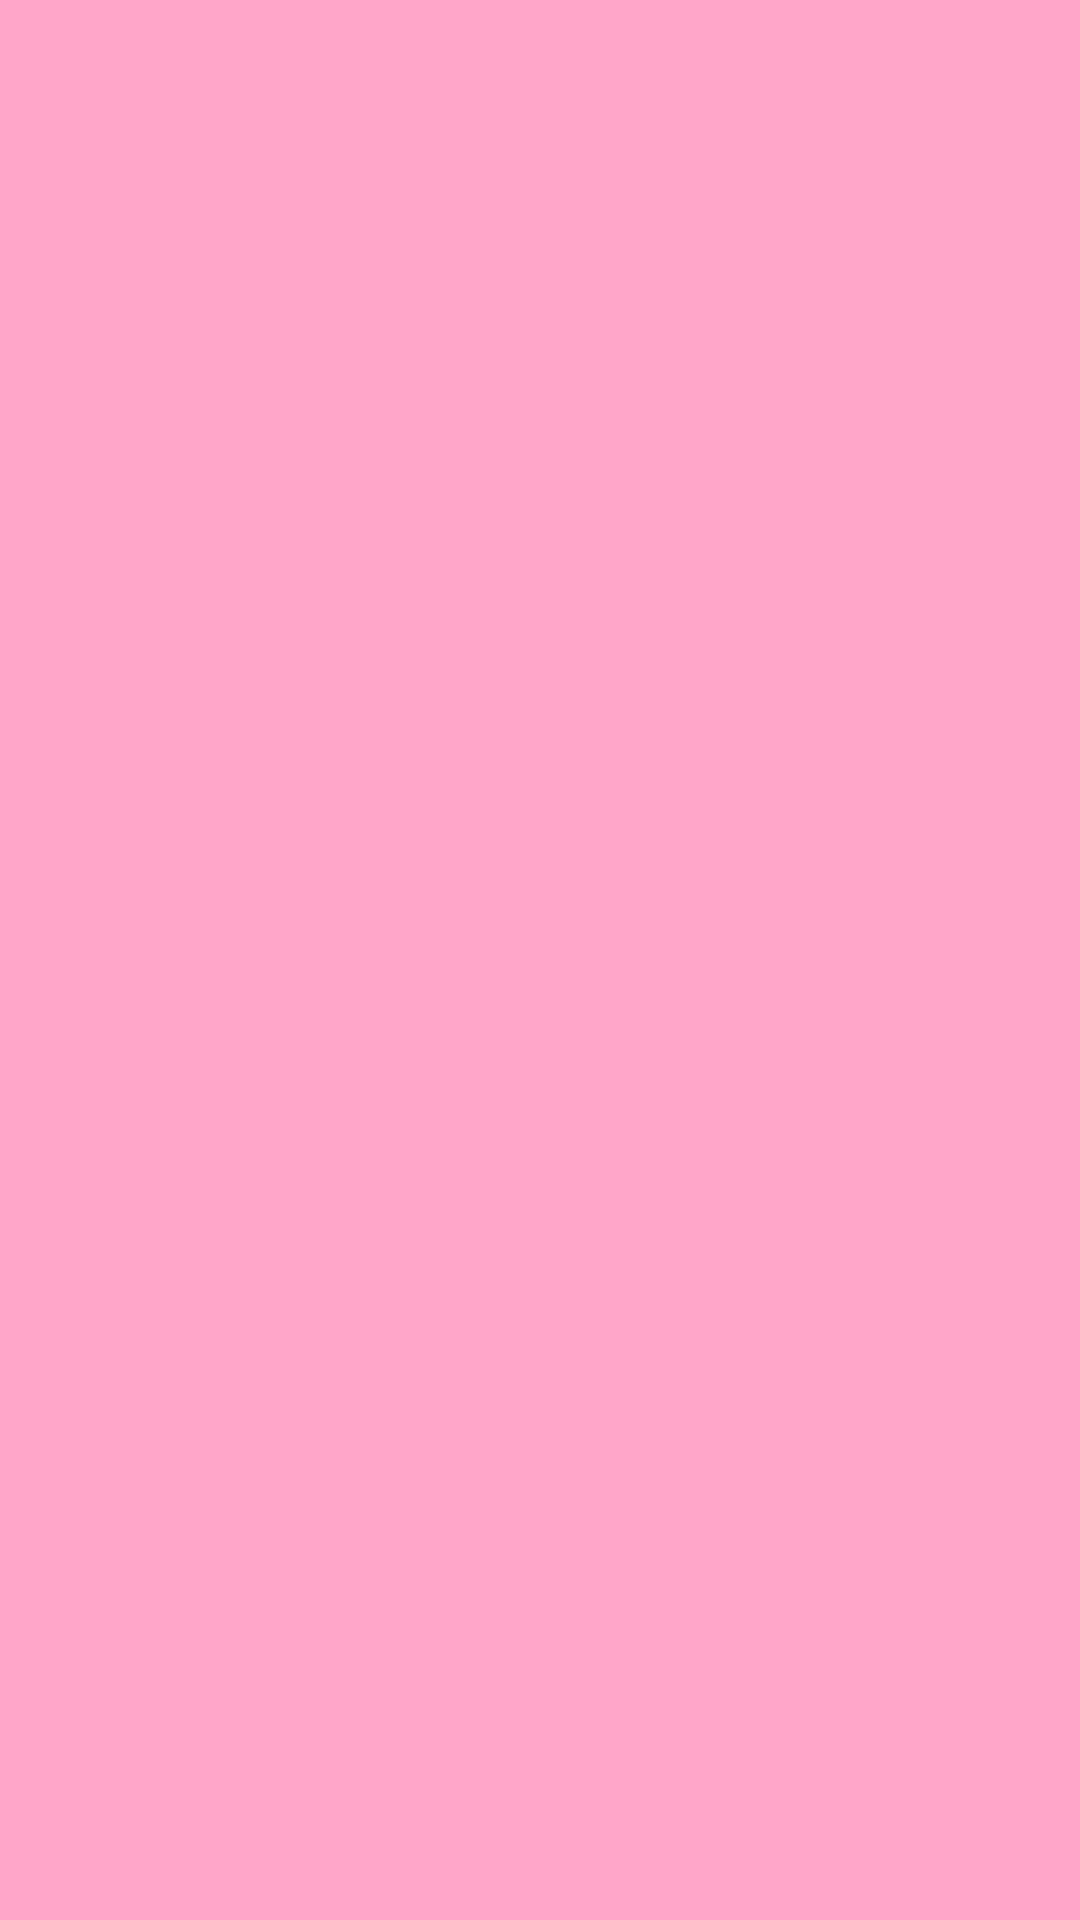 1080x1920 Carnation Pink Solid Color Background